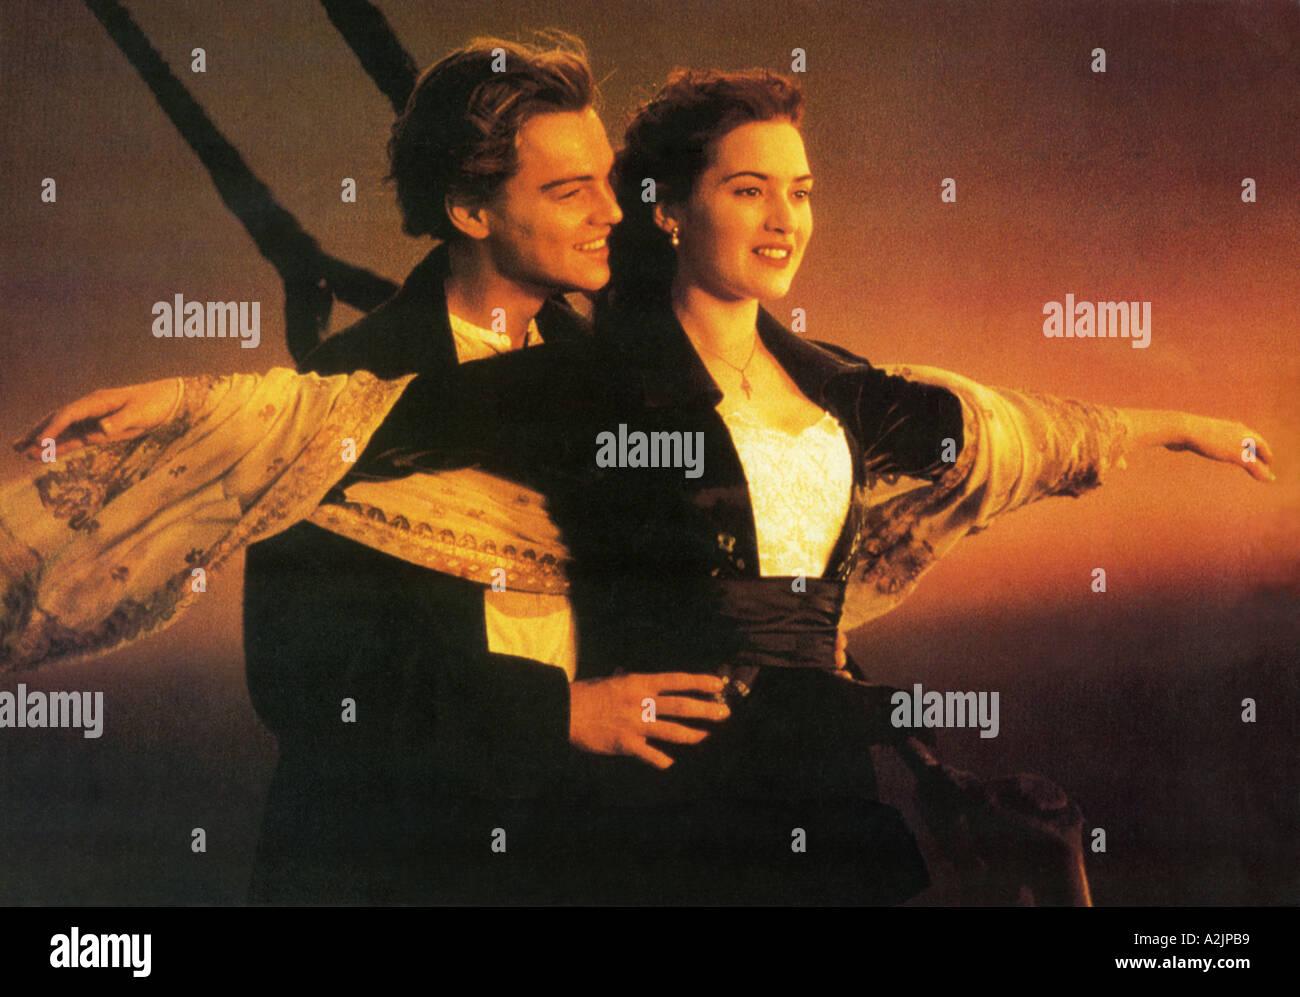 TITANIC premio Oscar 1997 film interpretato da Leonardo DiCaprio e Kate Winslet Foto Stock